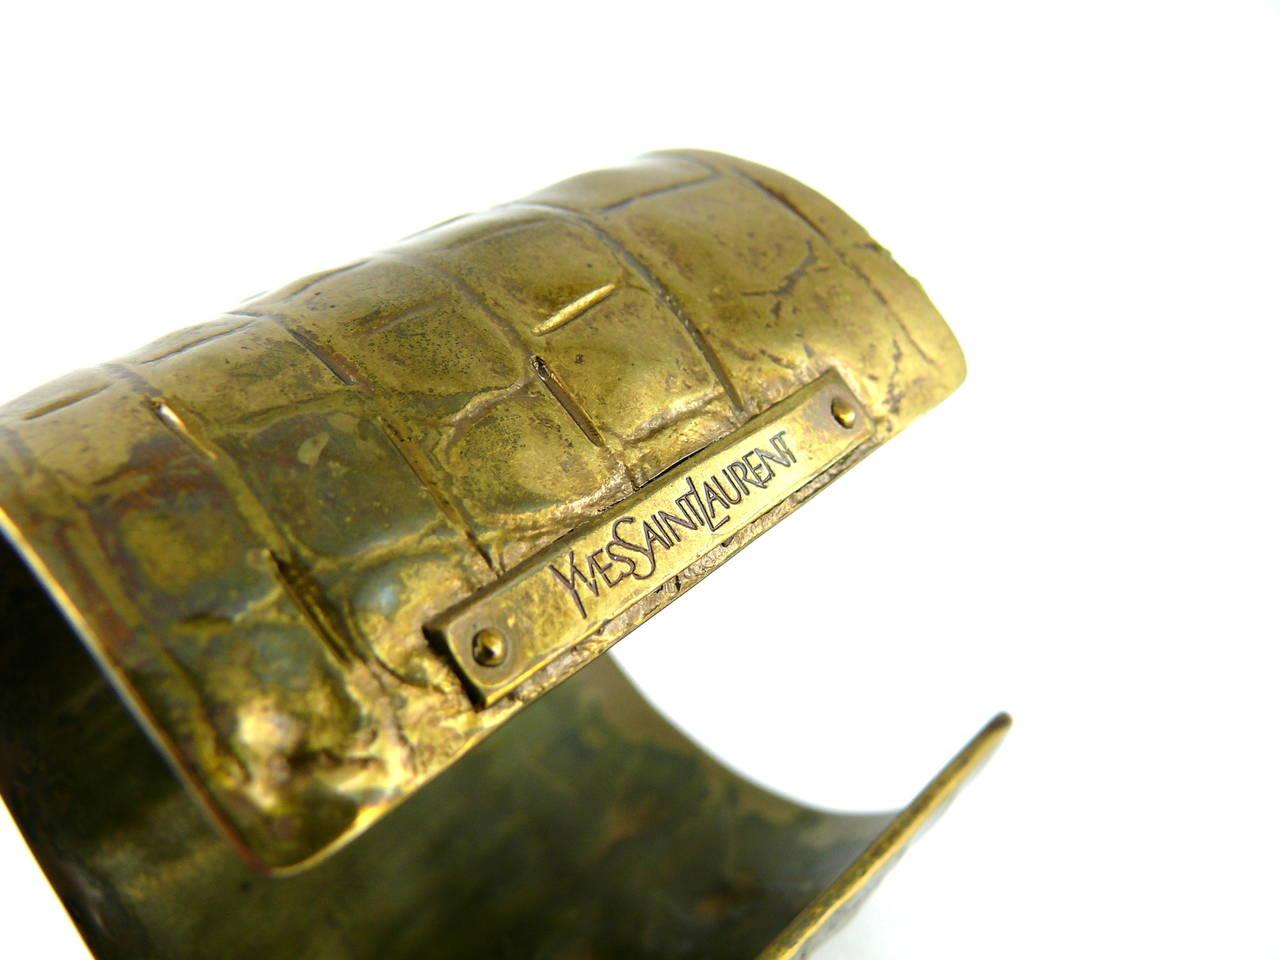 Yves Saint Laurent YSL by Tom Ford Croc-Embossed Cuff Bracelet 9